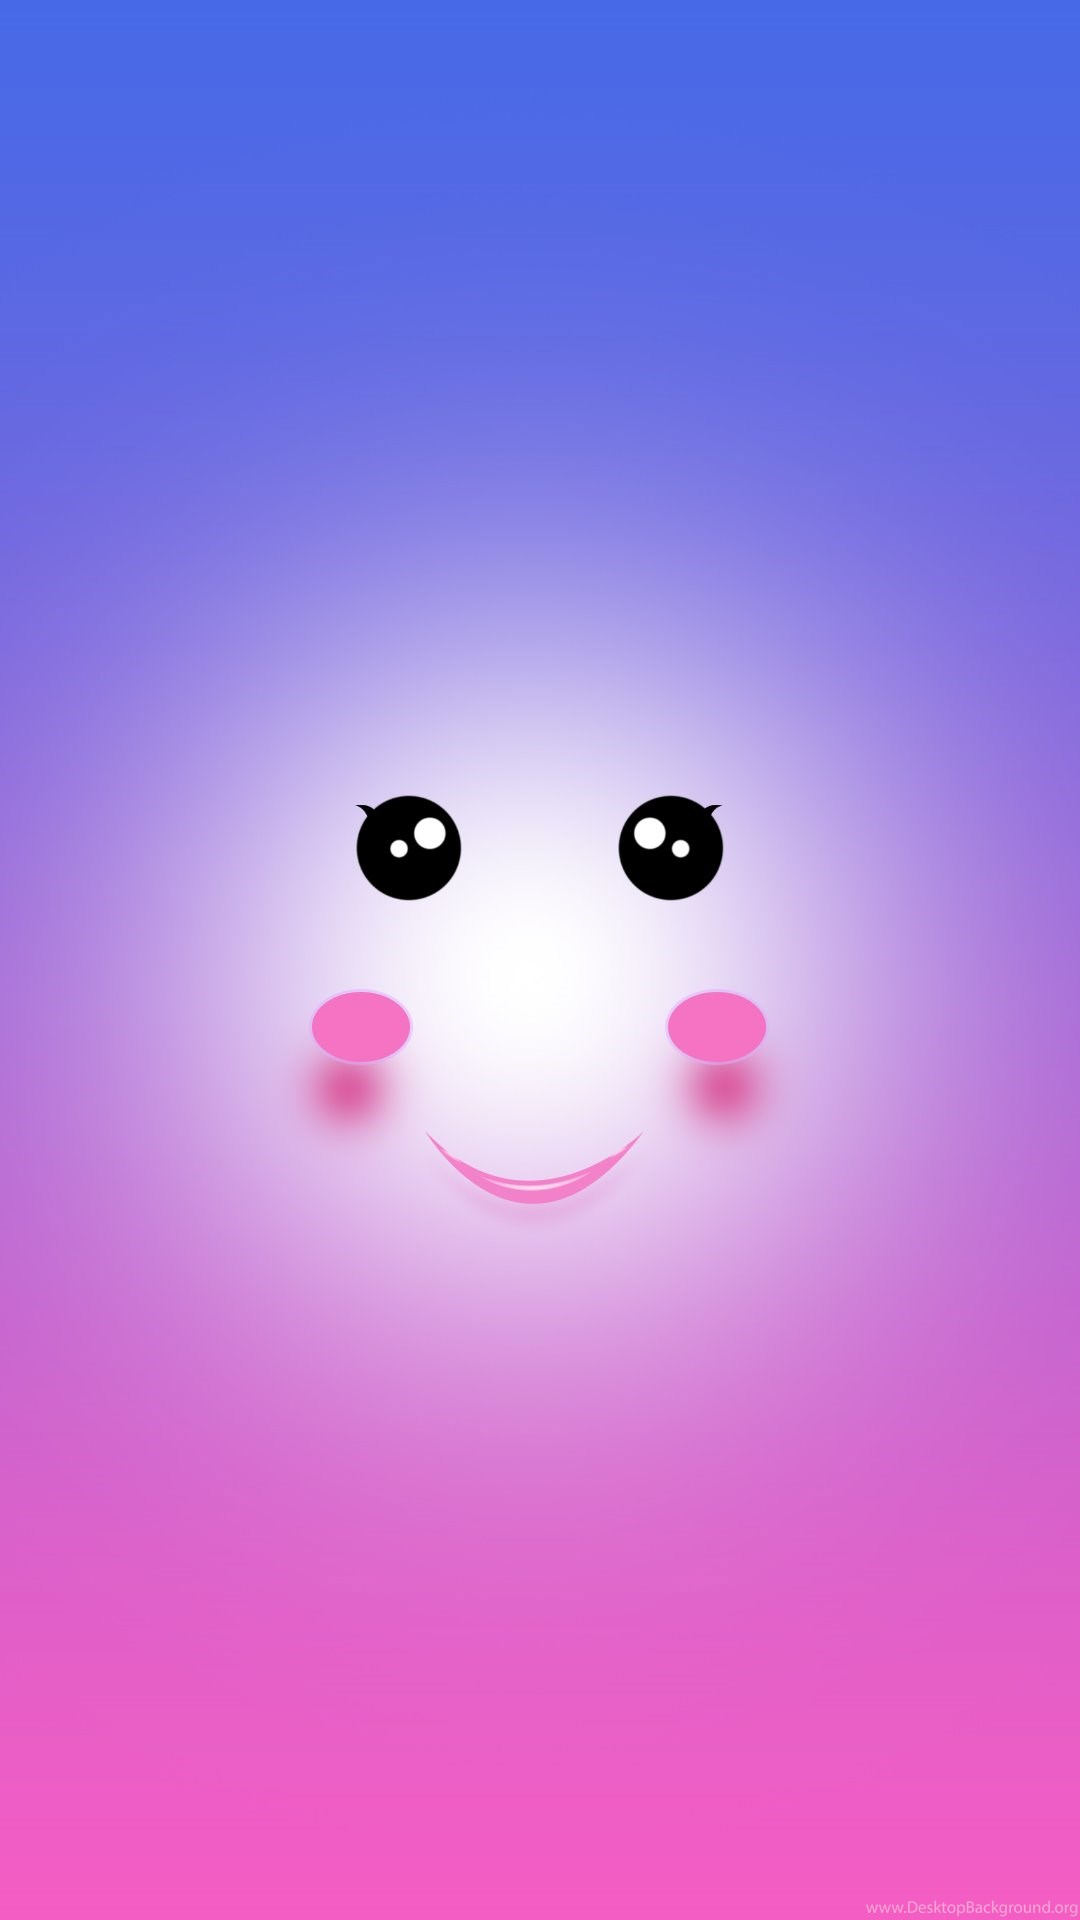 Cute Kawaii Iphone Wallpapers By Folicorow16 On Deviantart Desktop Background